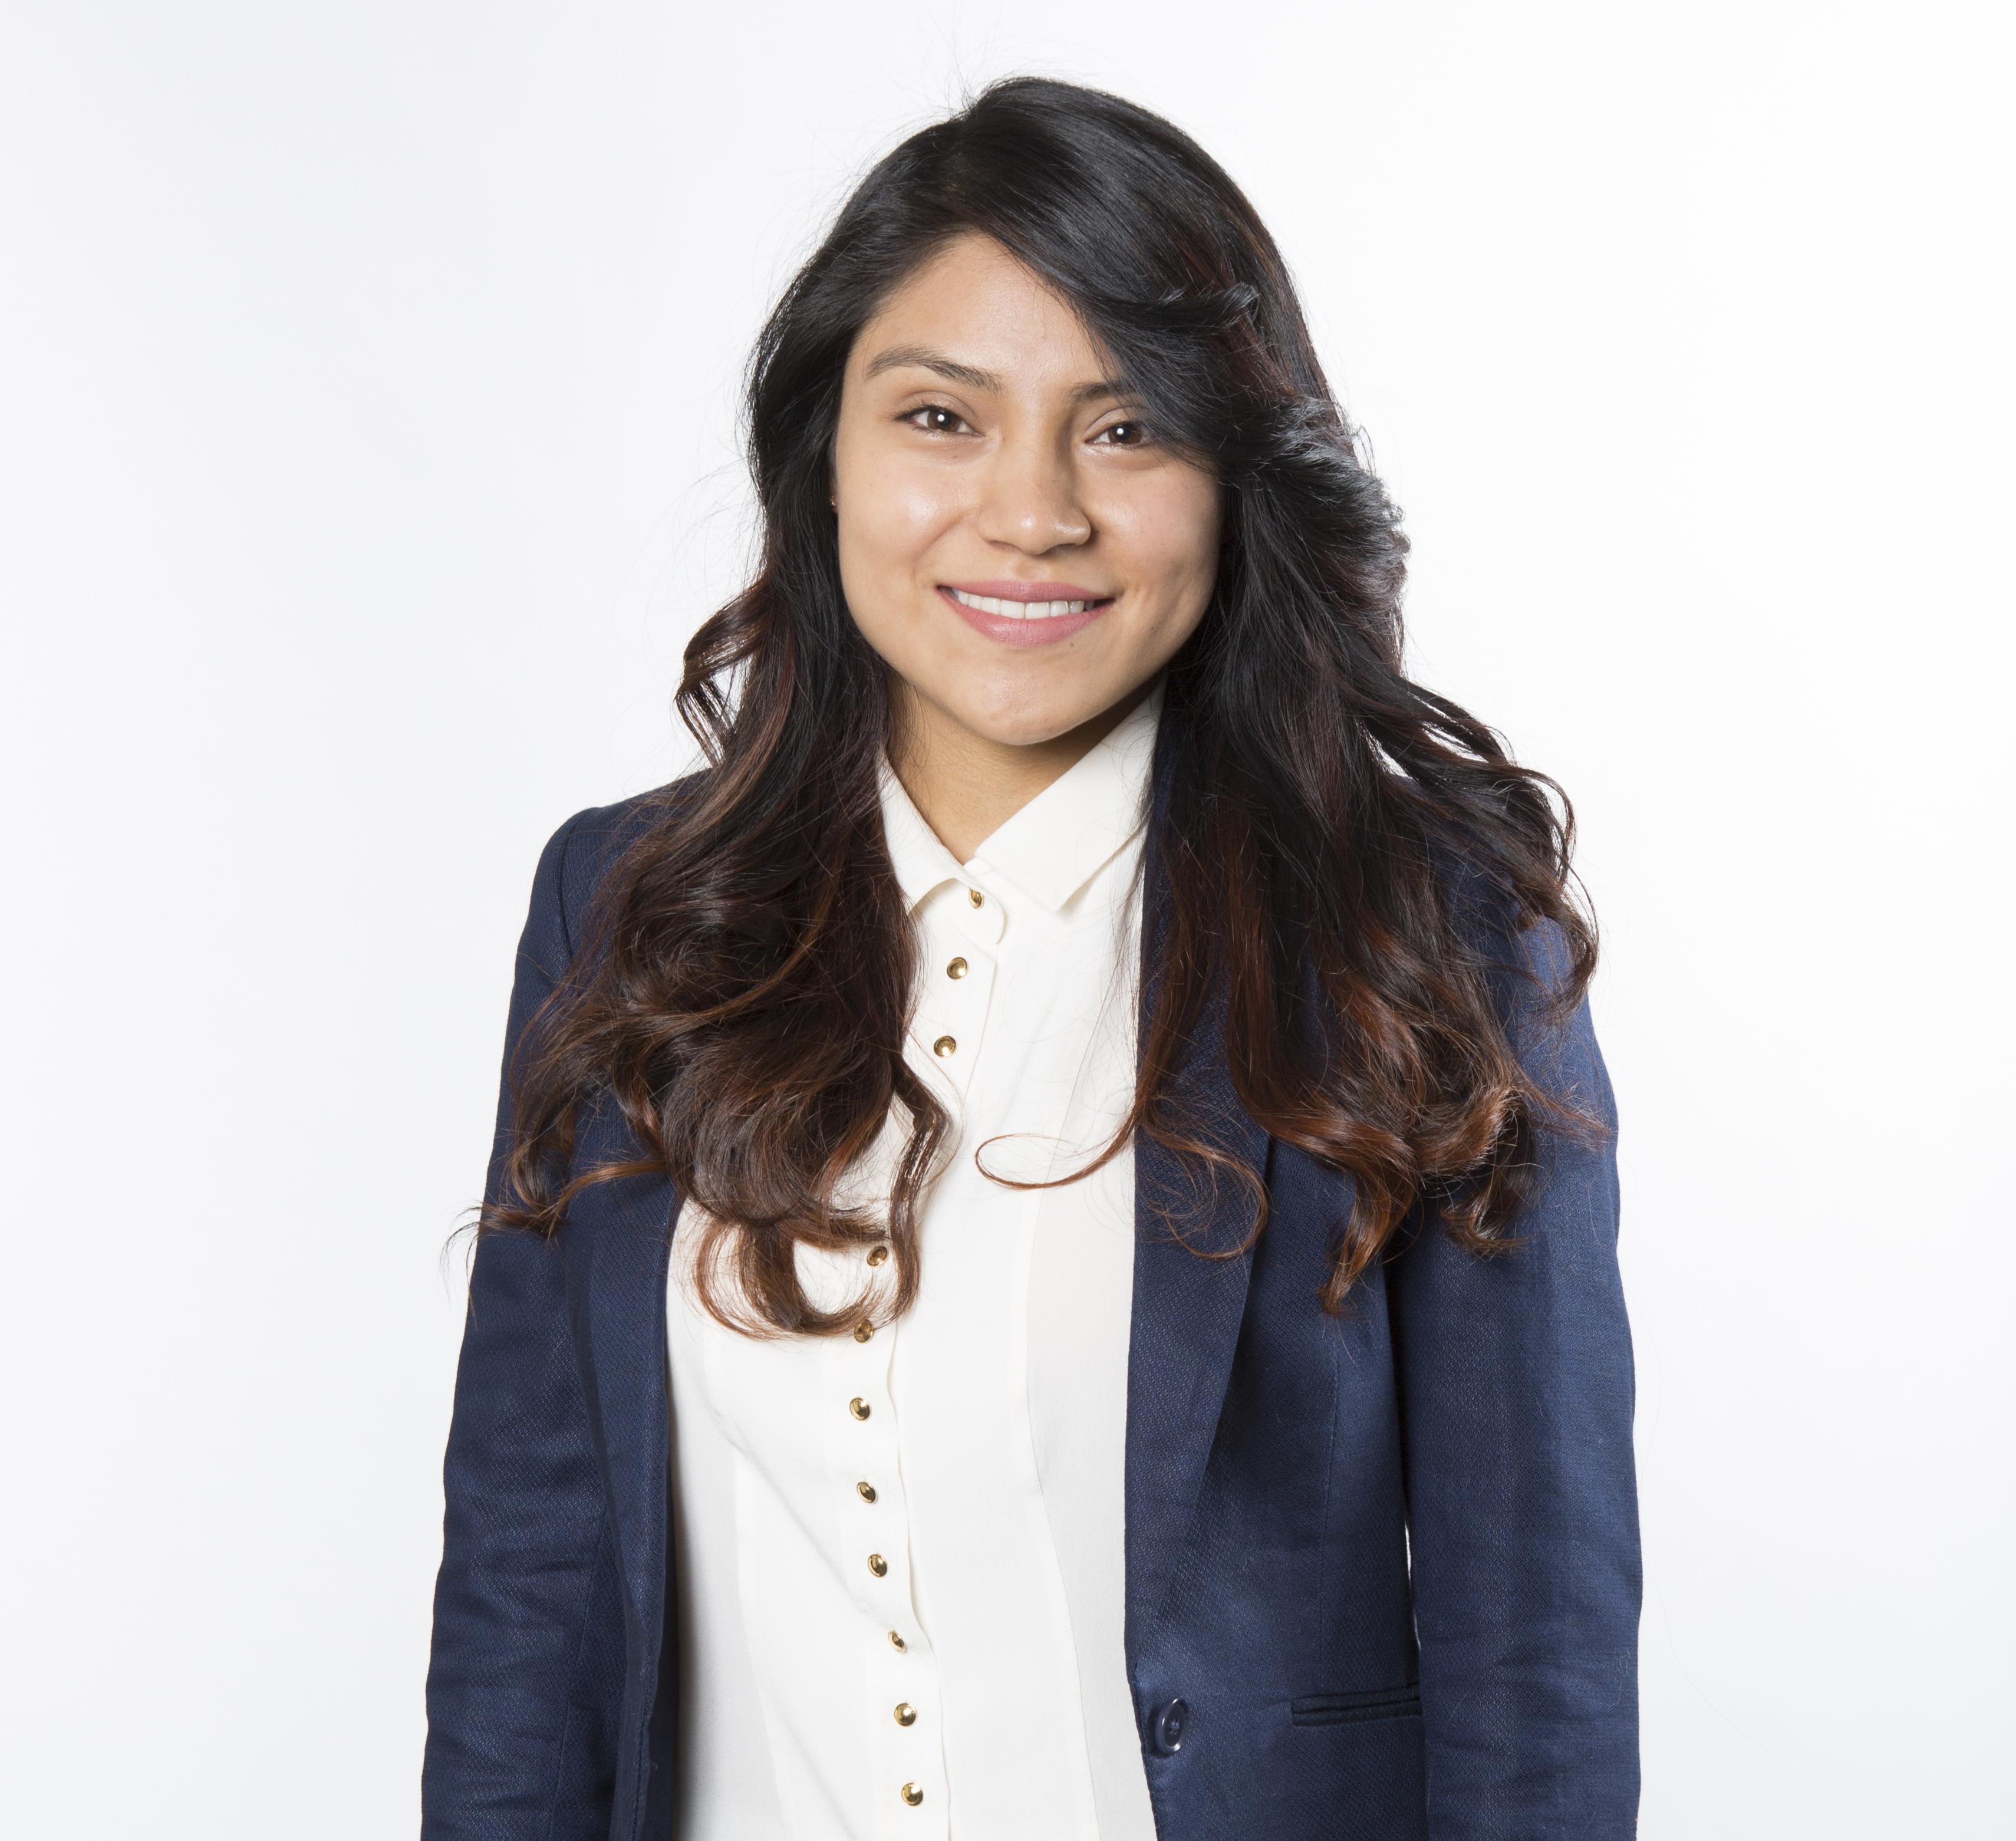 Priscila Lopez-Trujillo